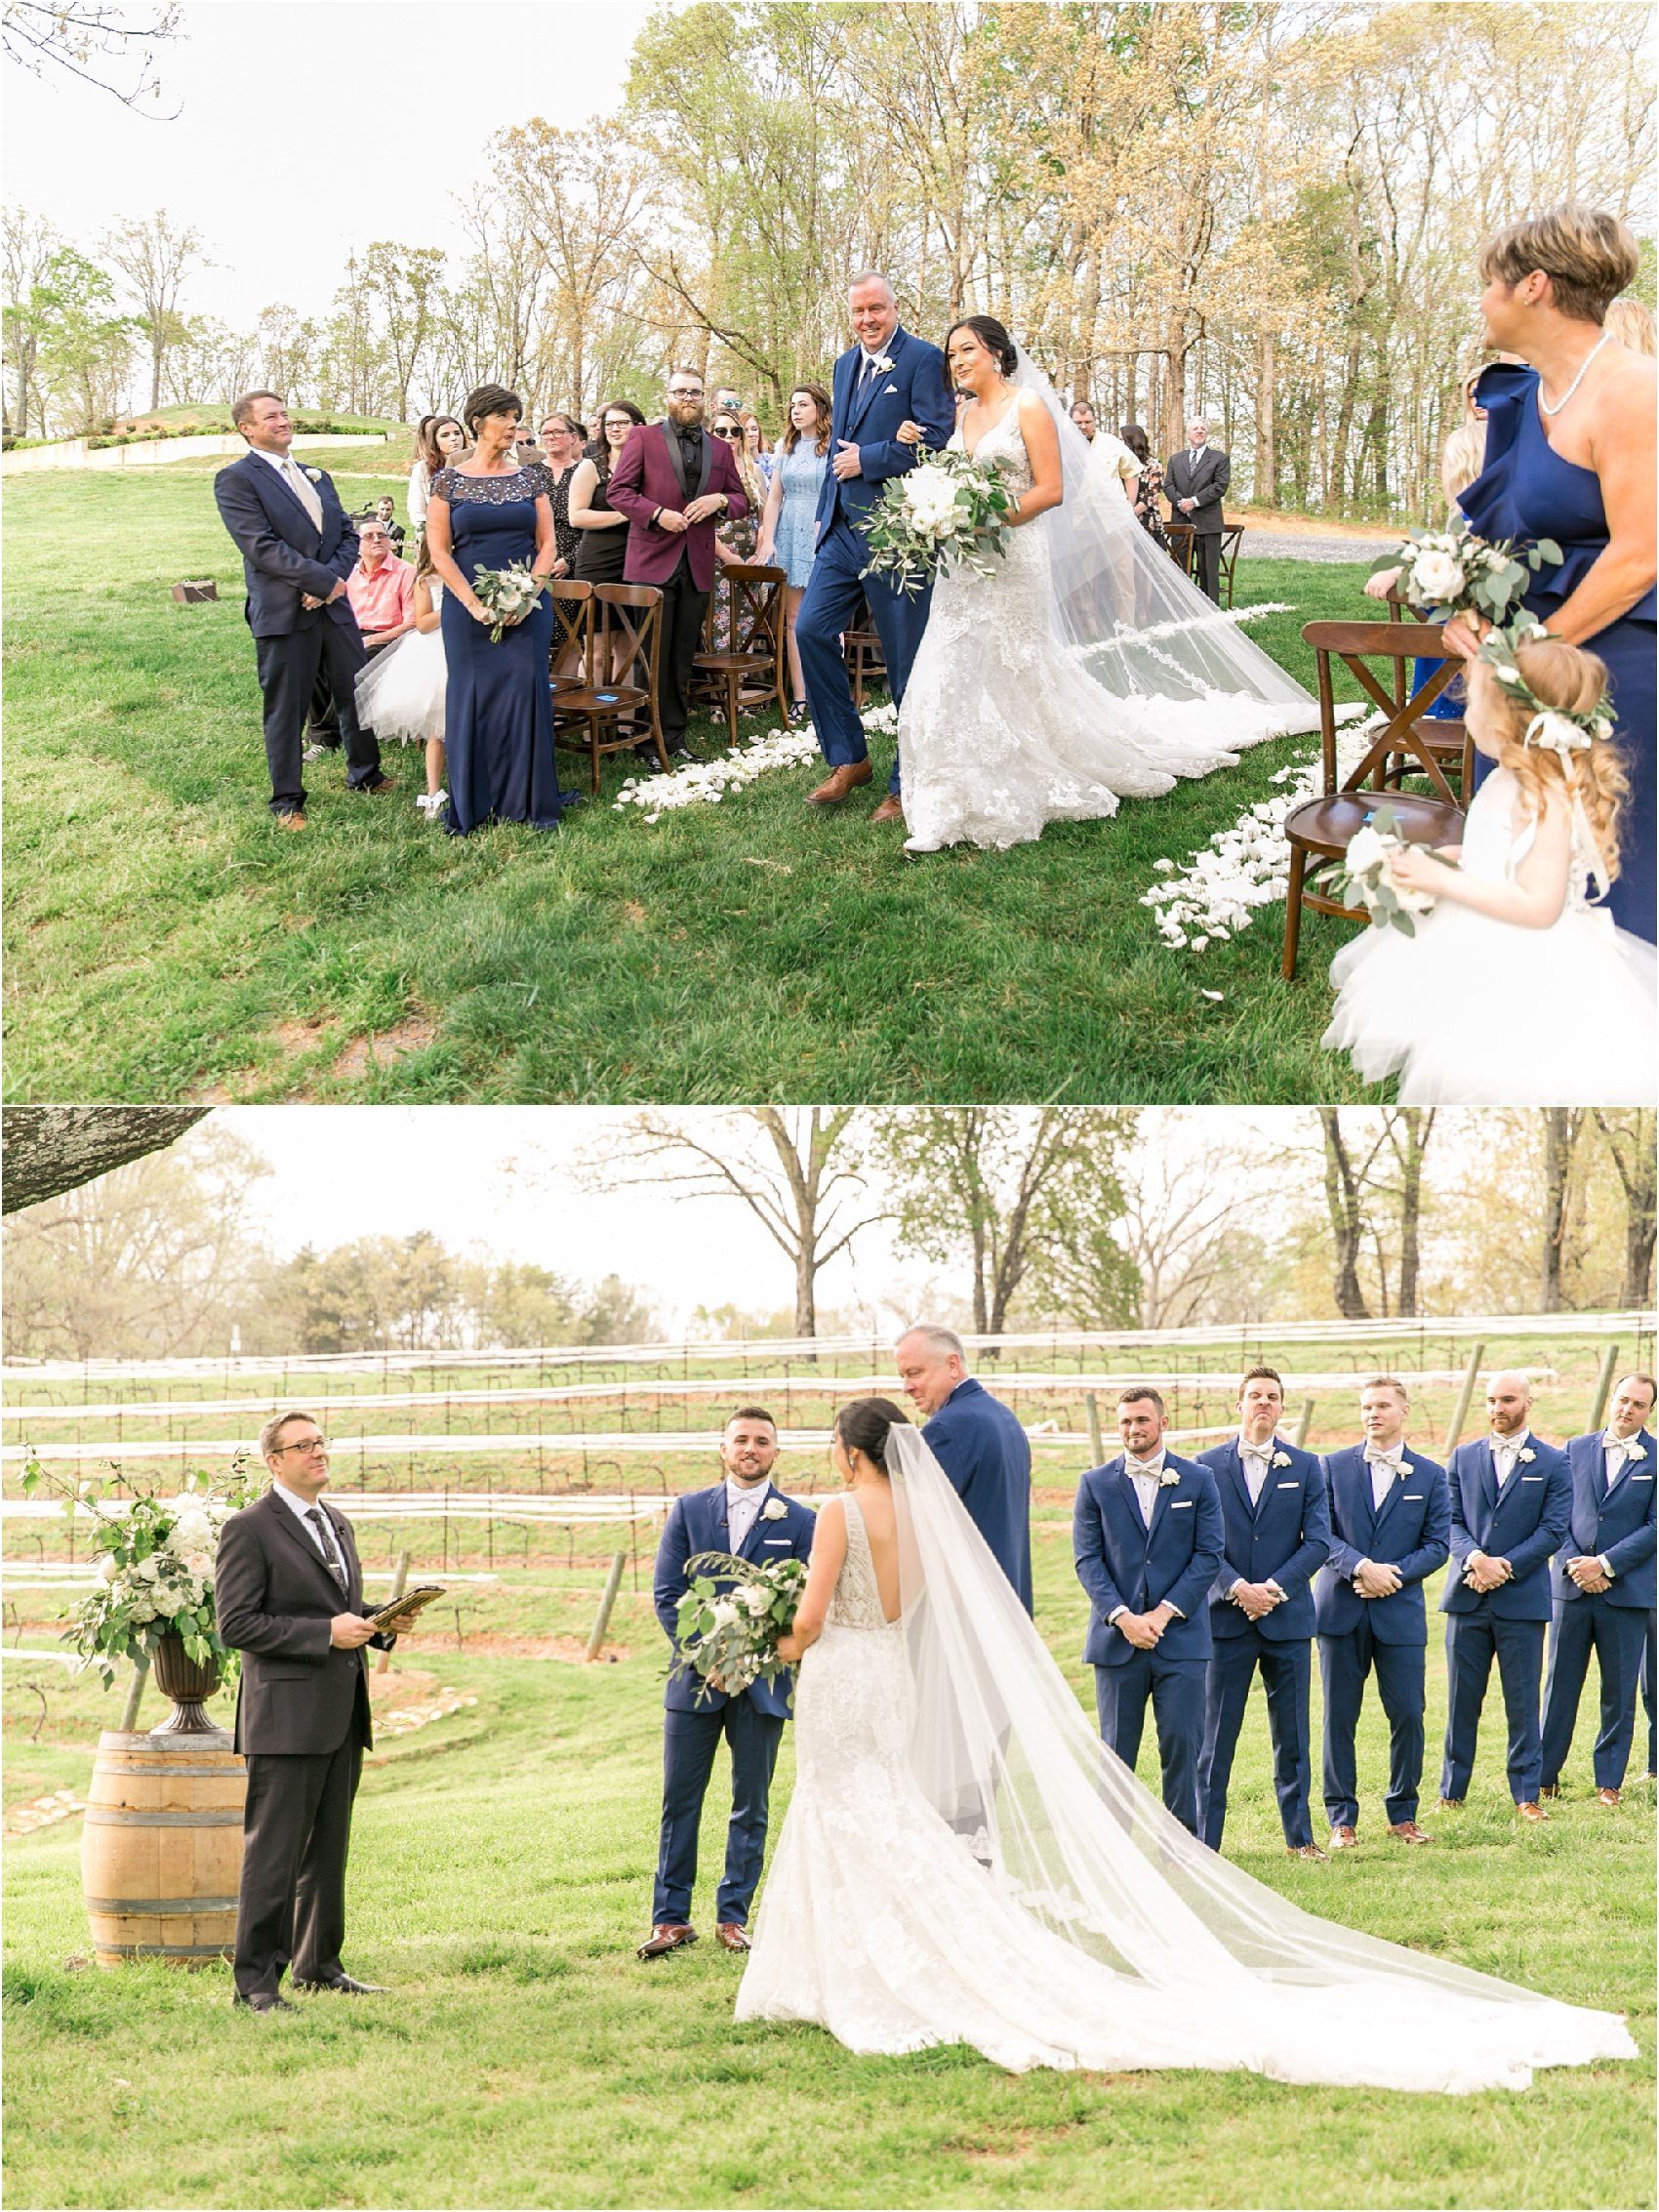 Savannah Eve Photography- Turnbill-Gilgan Wedding- Blog-38.jpg